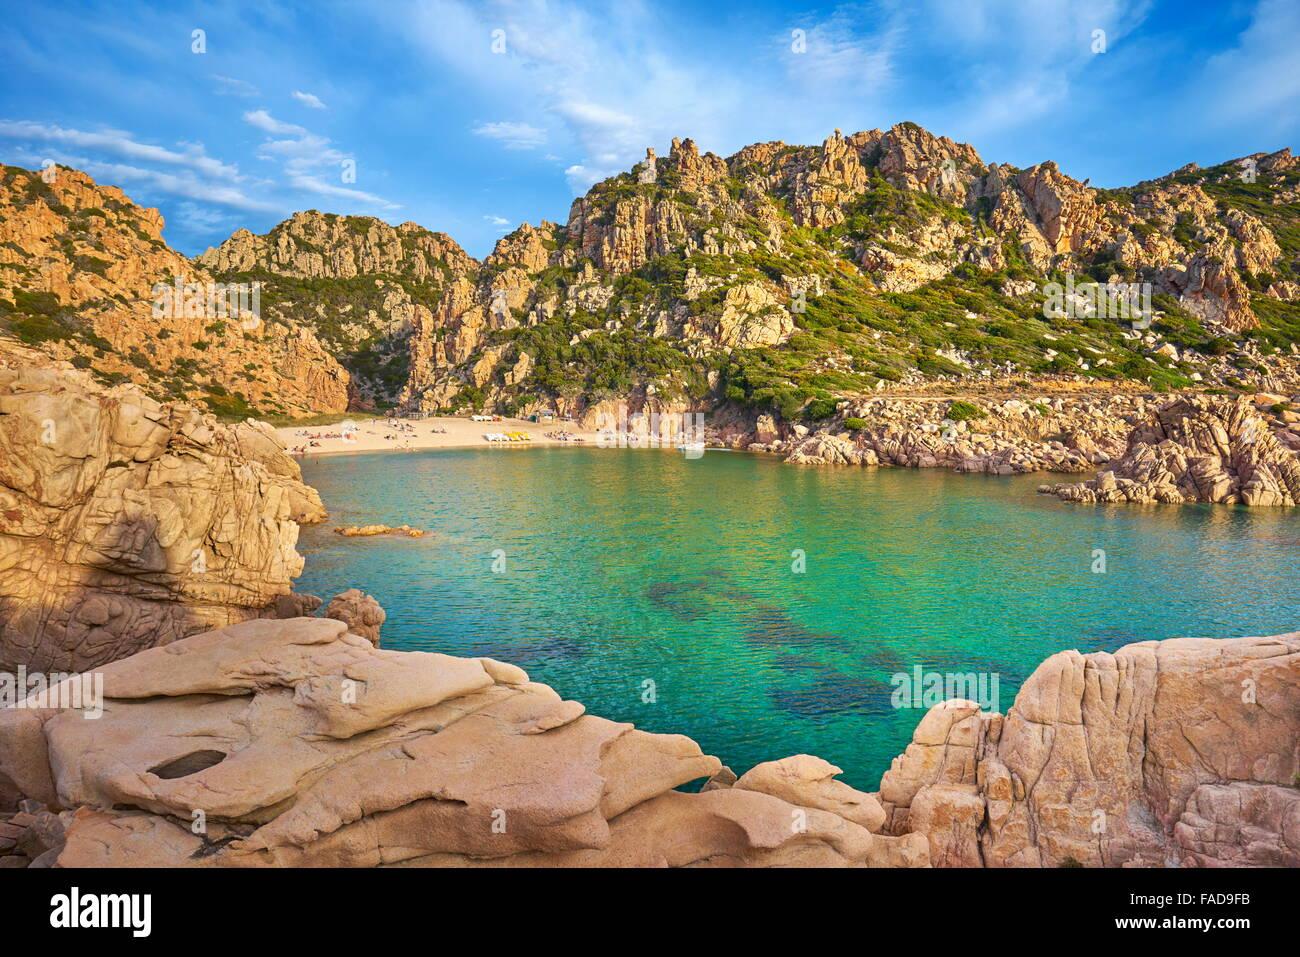 Costa Paradiso Beach, Sardinia Island, Italy - Stock Image